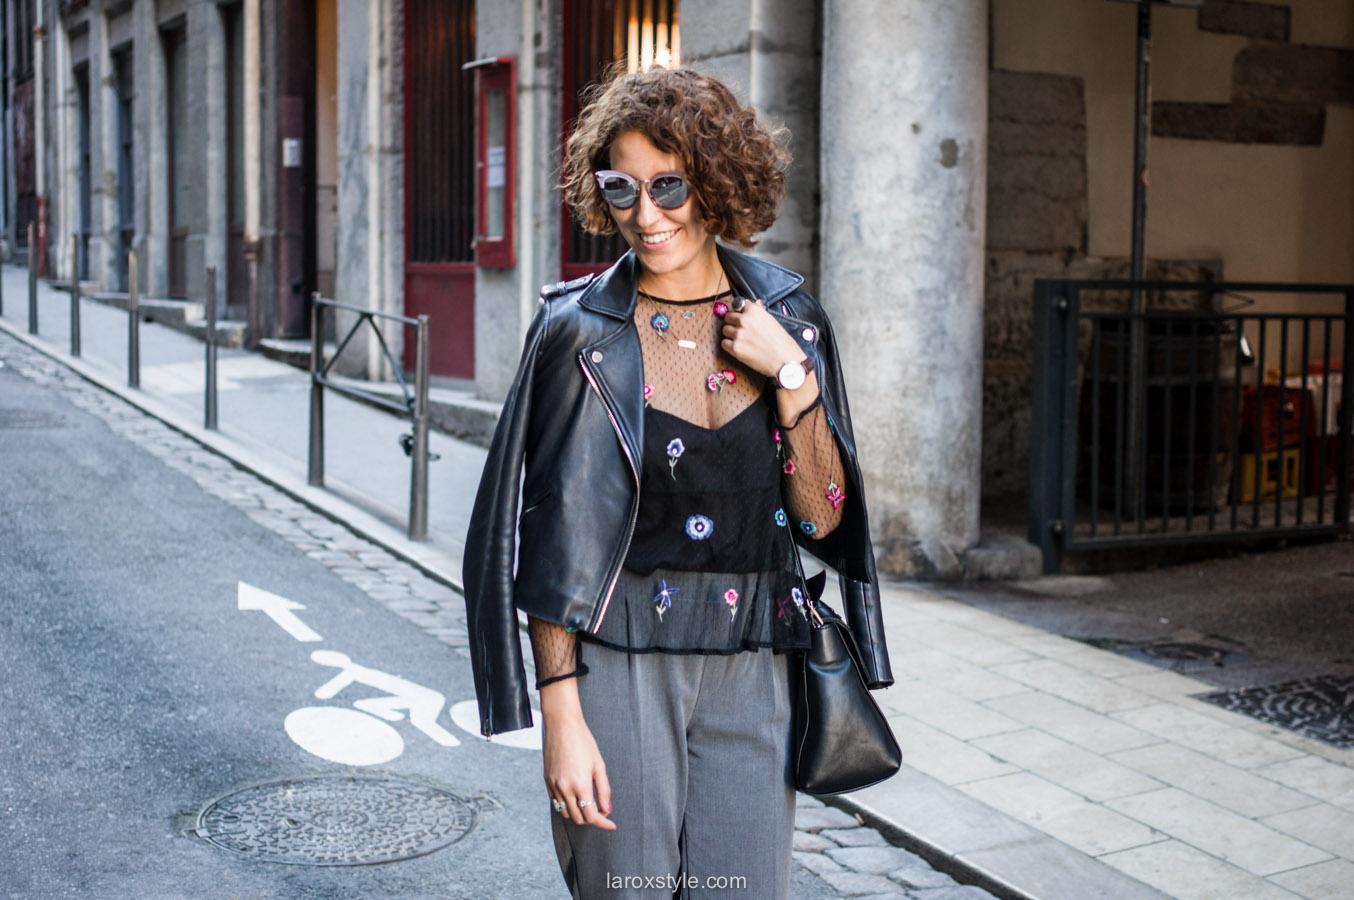 look pantalon gris - perfecto cuir - top broderies - laroxstyle blog mode lyon-5